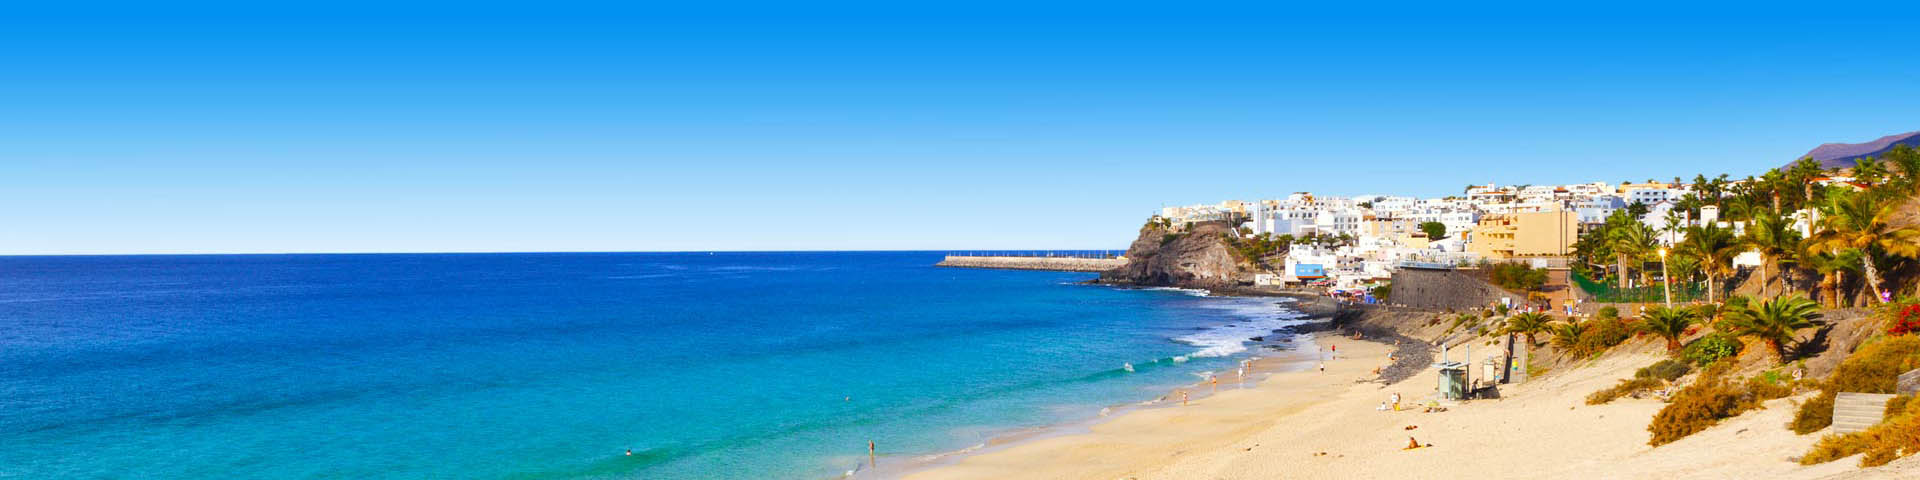 Azuurblauwe zee met prachtig zandstrand